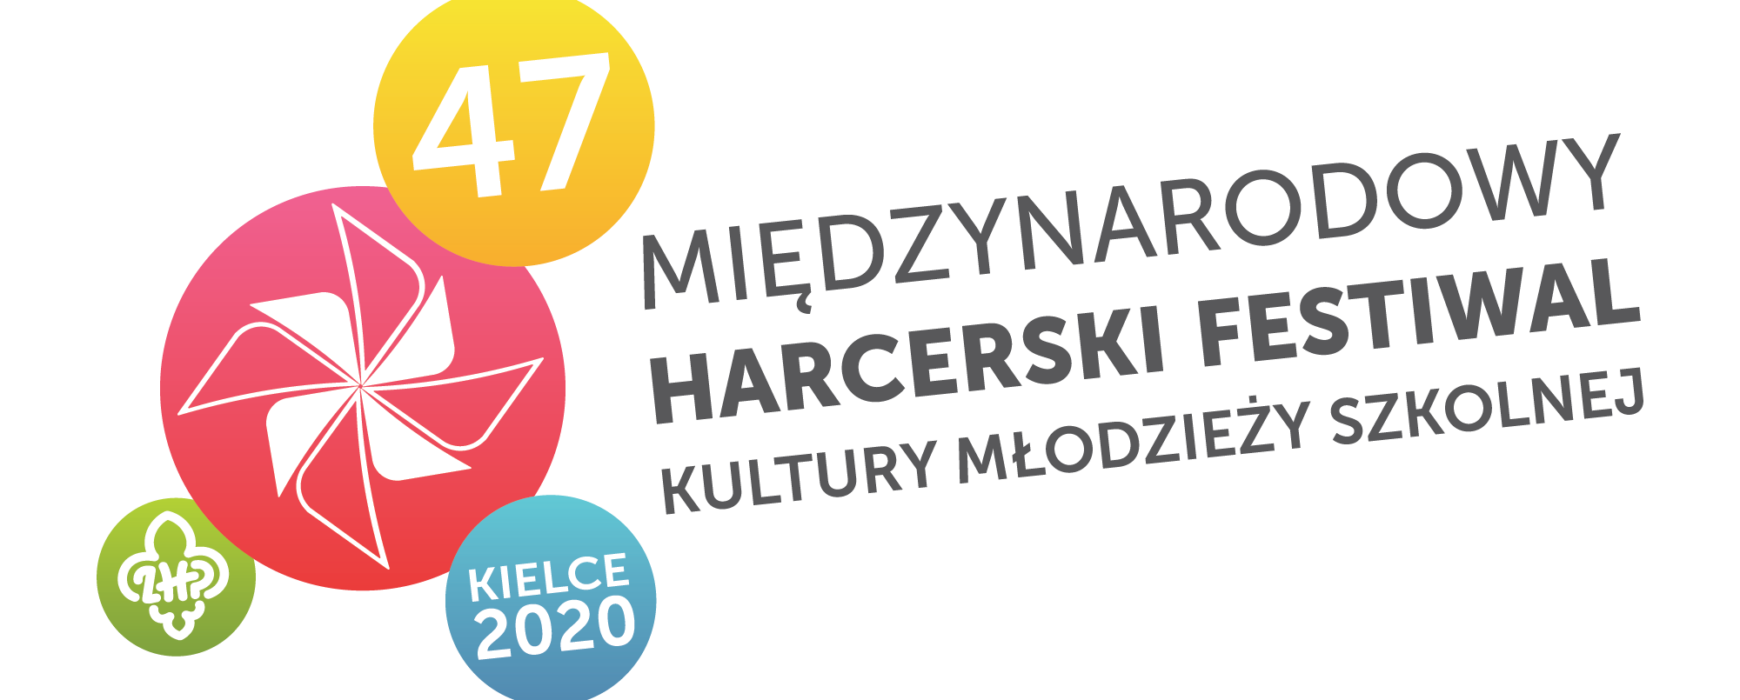 "Harcerski Festiwal Piosenki ""Bez gitary ani rusz"" 2020"